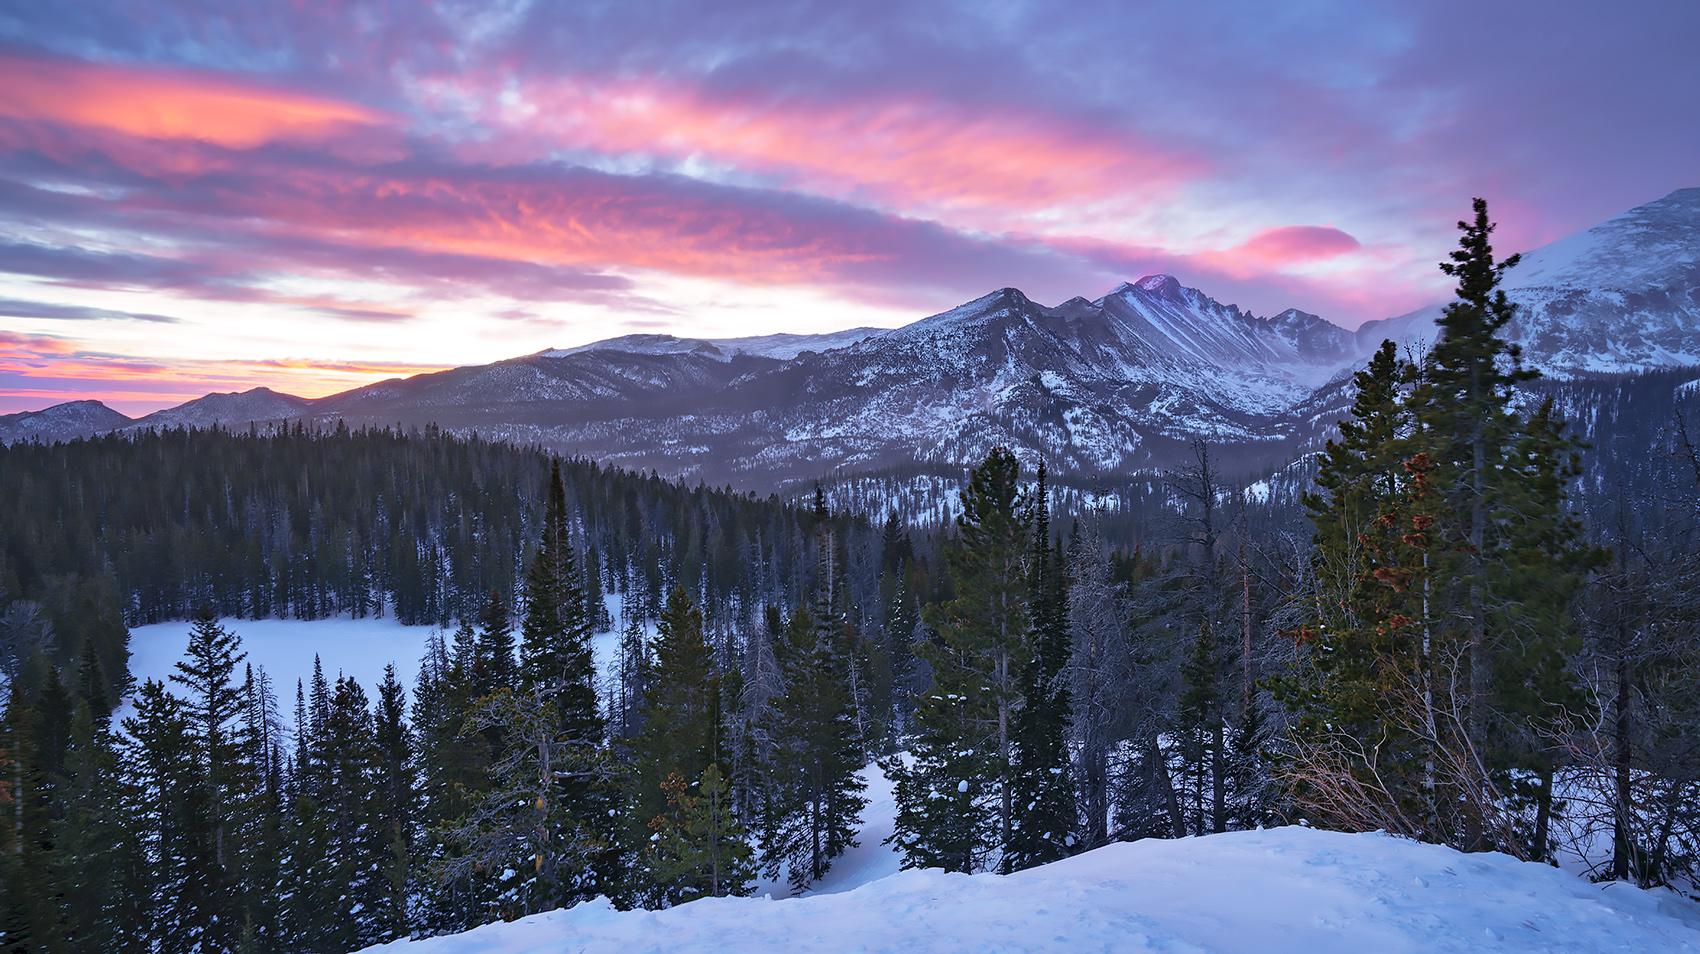 Longs Peak, Rocky Mountain National Park, Colorado, sunrise, photo